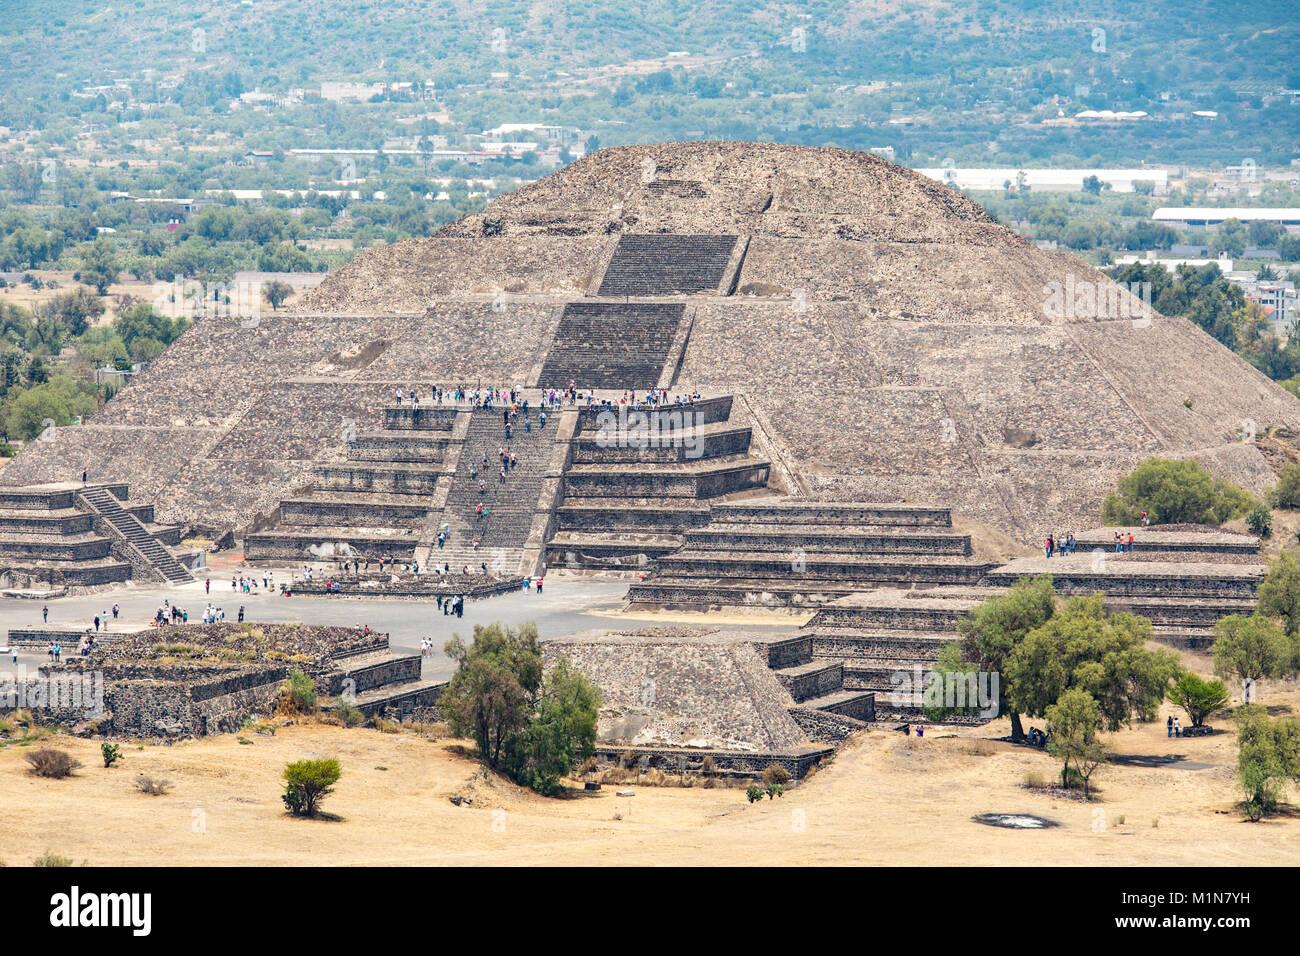 Pyramid of the Sun, Teotihuacán, Mexico City, Mexico - Stock Image